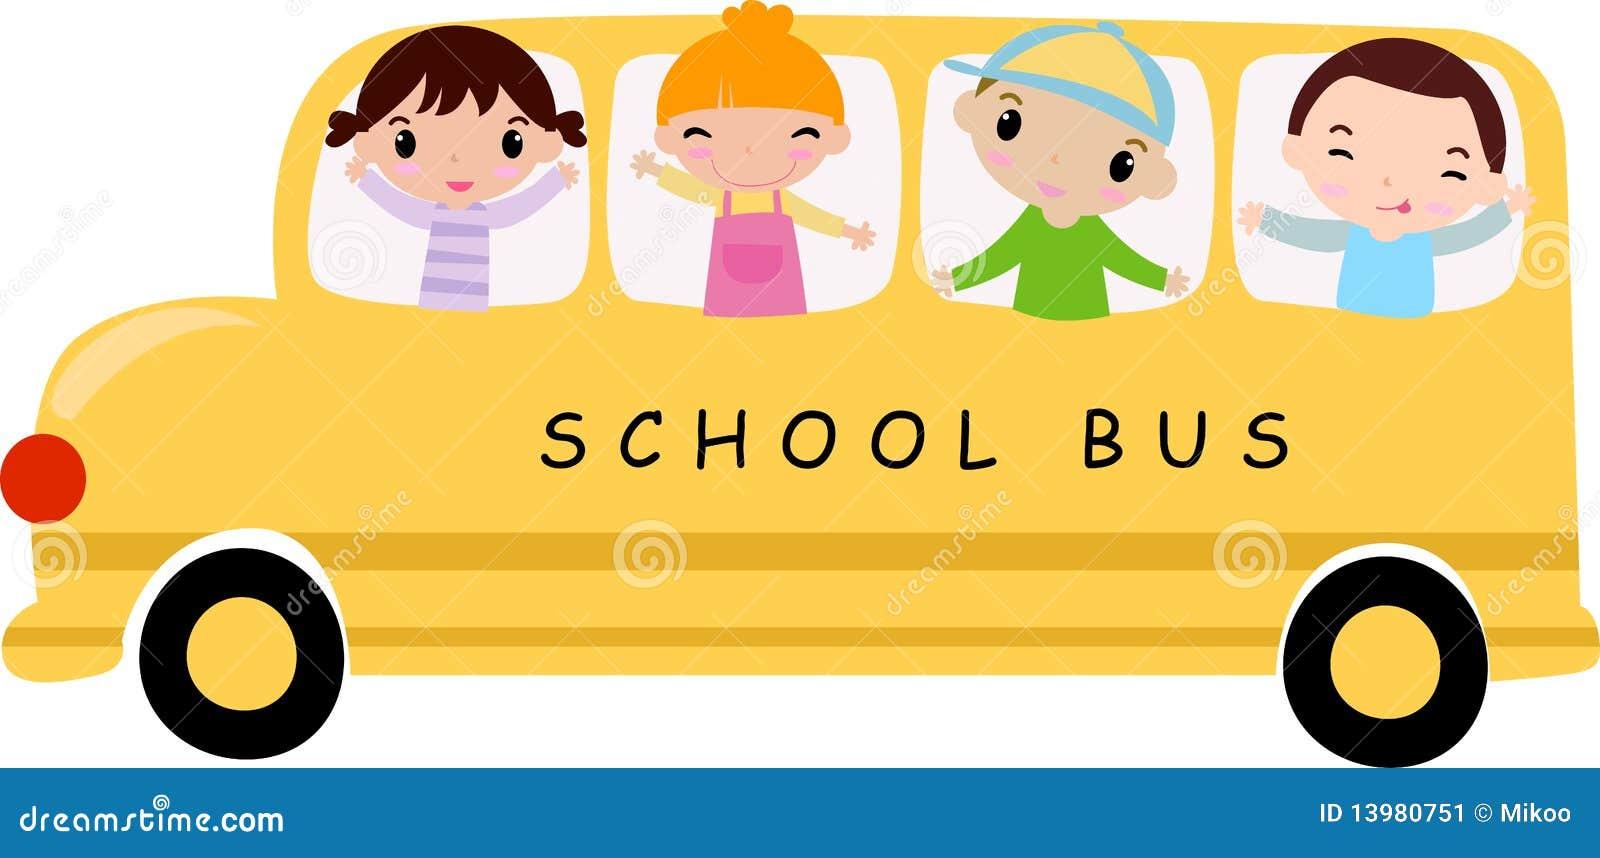 school bus stock vector illustration of white background 13980751 rh dreamstime com Elementary School Clip Art Magic School Bus Clip Art